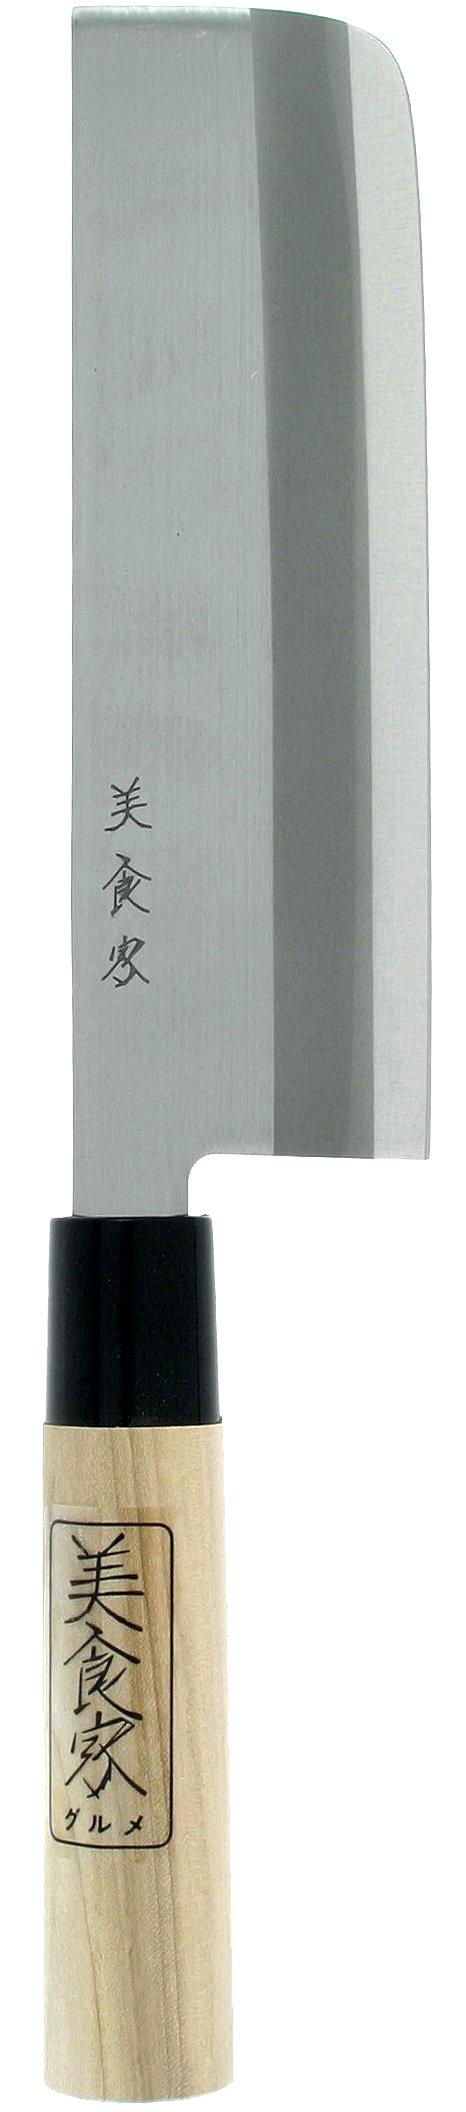 Kotobuki Japanese Nakiri Vegetable Knife, 6 to 1/2-Inch, Silver by Kotobuki